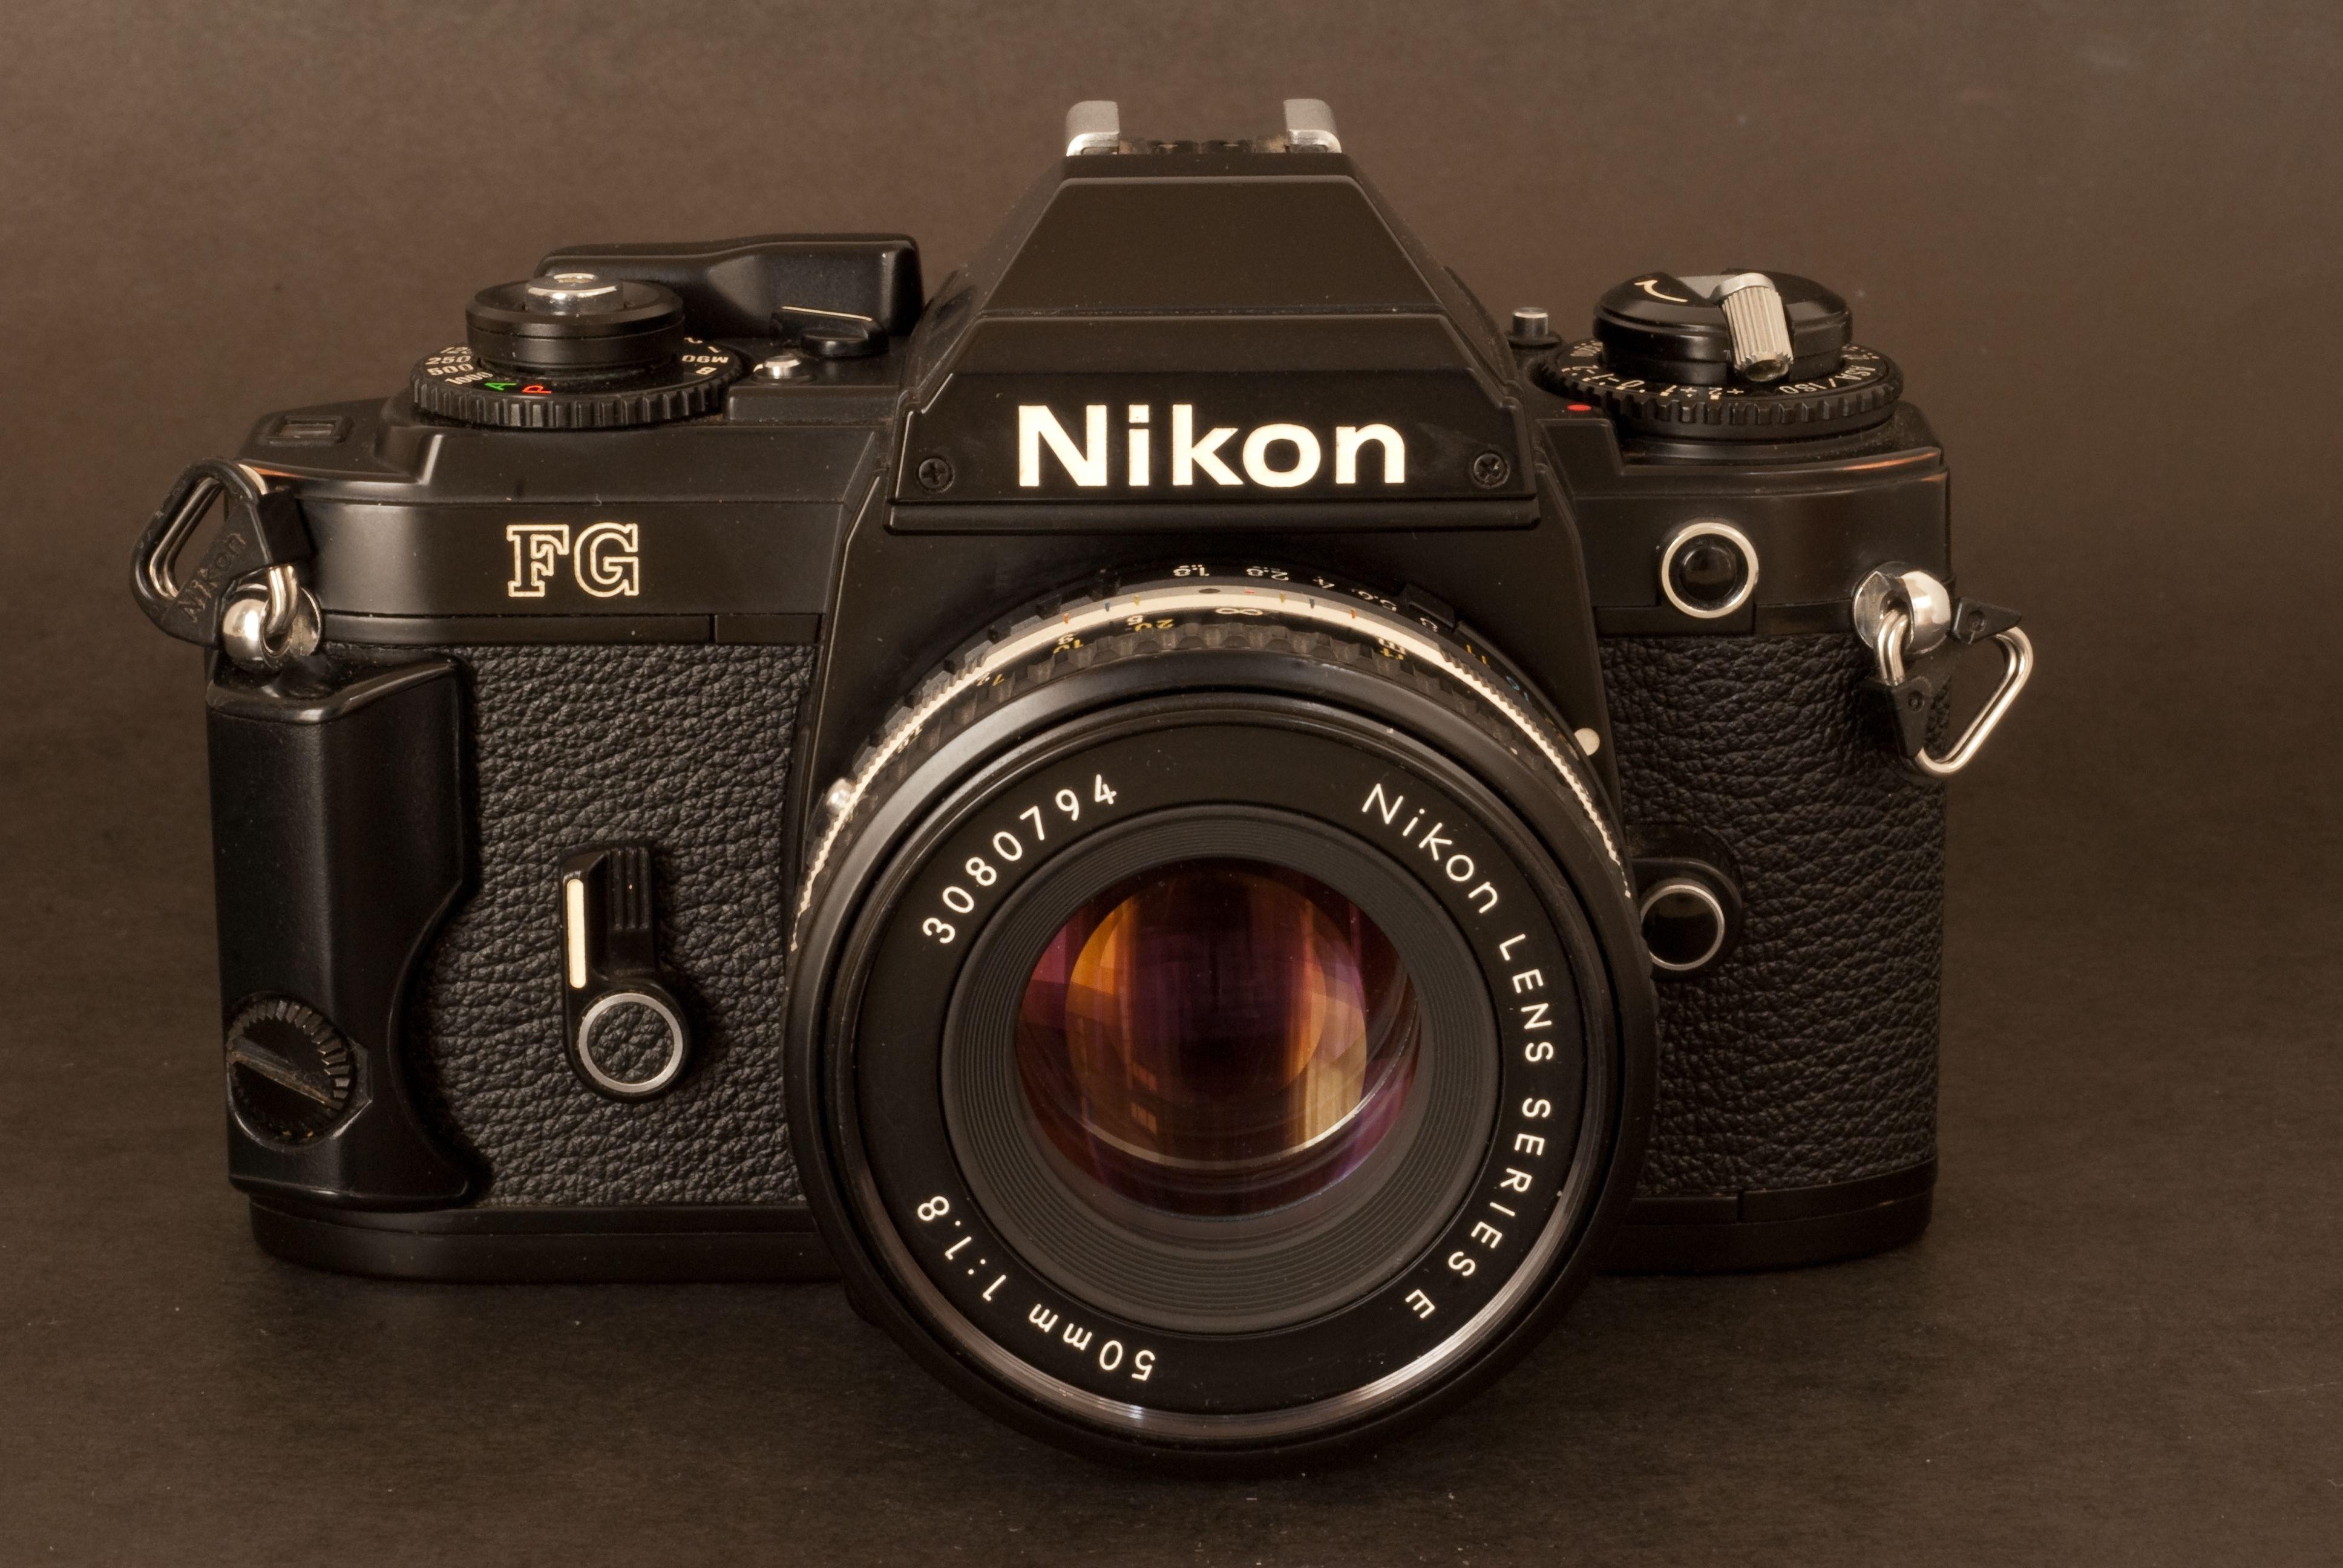 nikon fg classicam pinterest rh fi pinterest com Ken Rockwell Nikon FG Medium Format Nikon FG 20